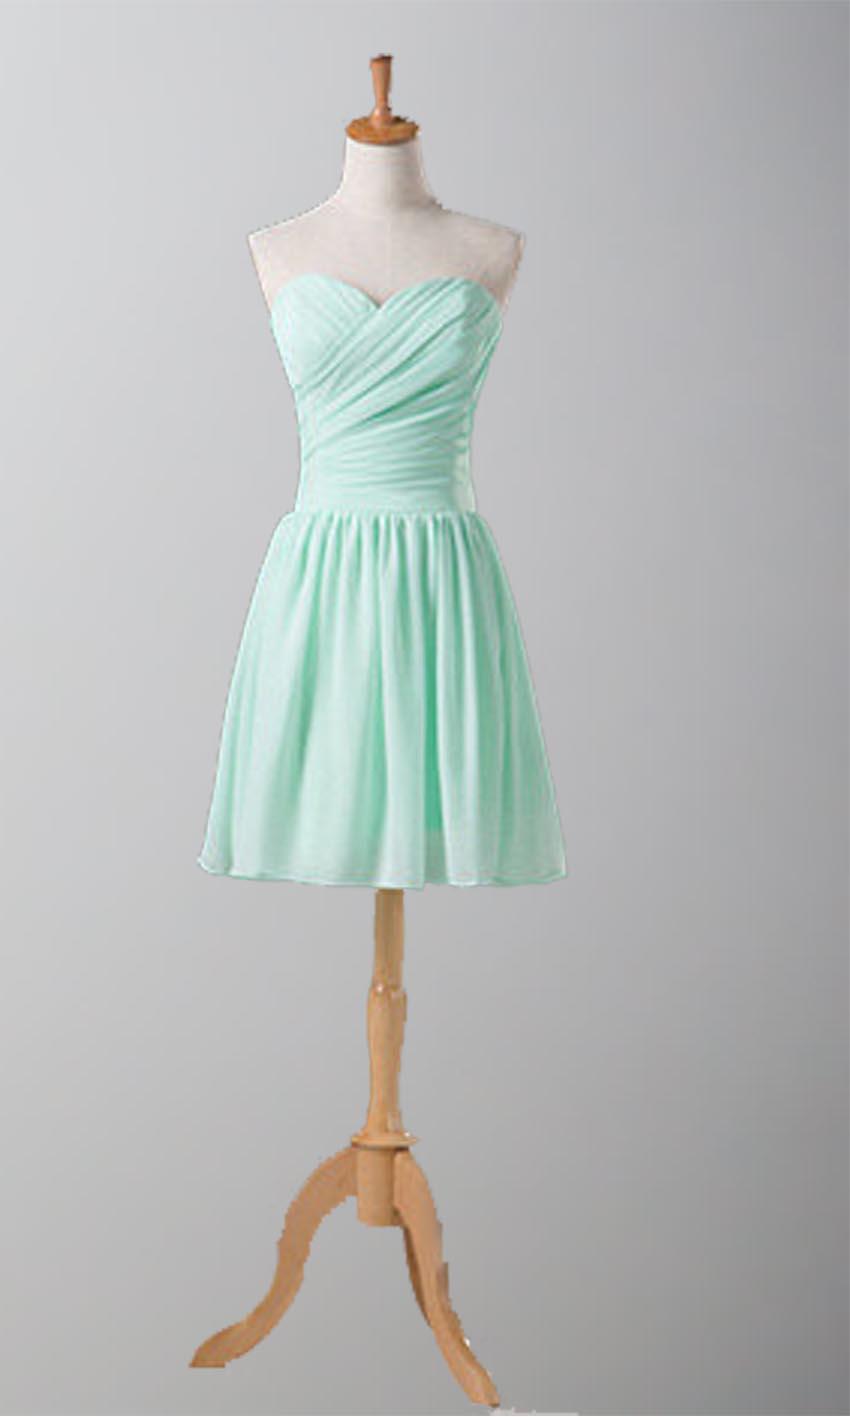 Short Cinch Waist Affordable Bridesmaid Dress KSP267 [KSP267 ...